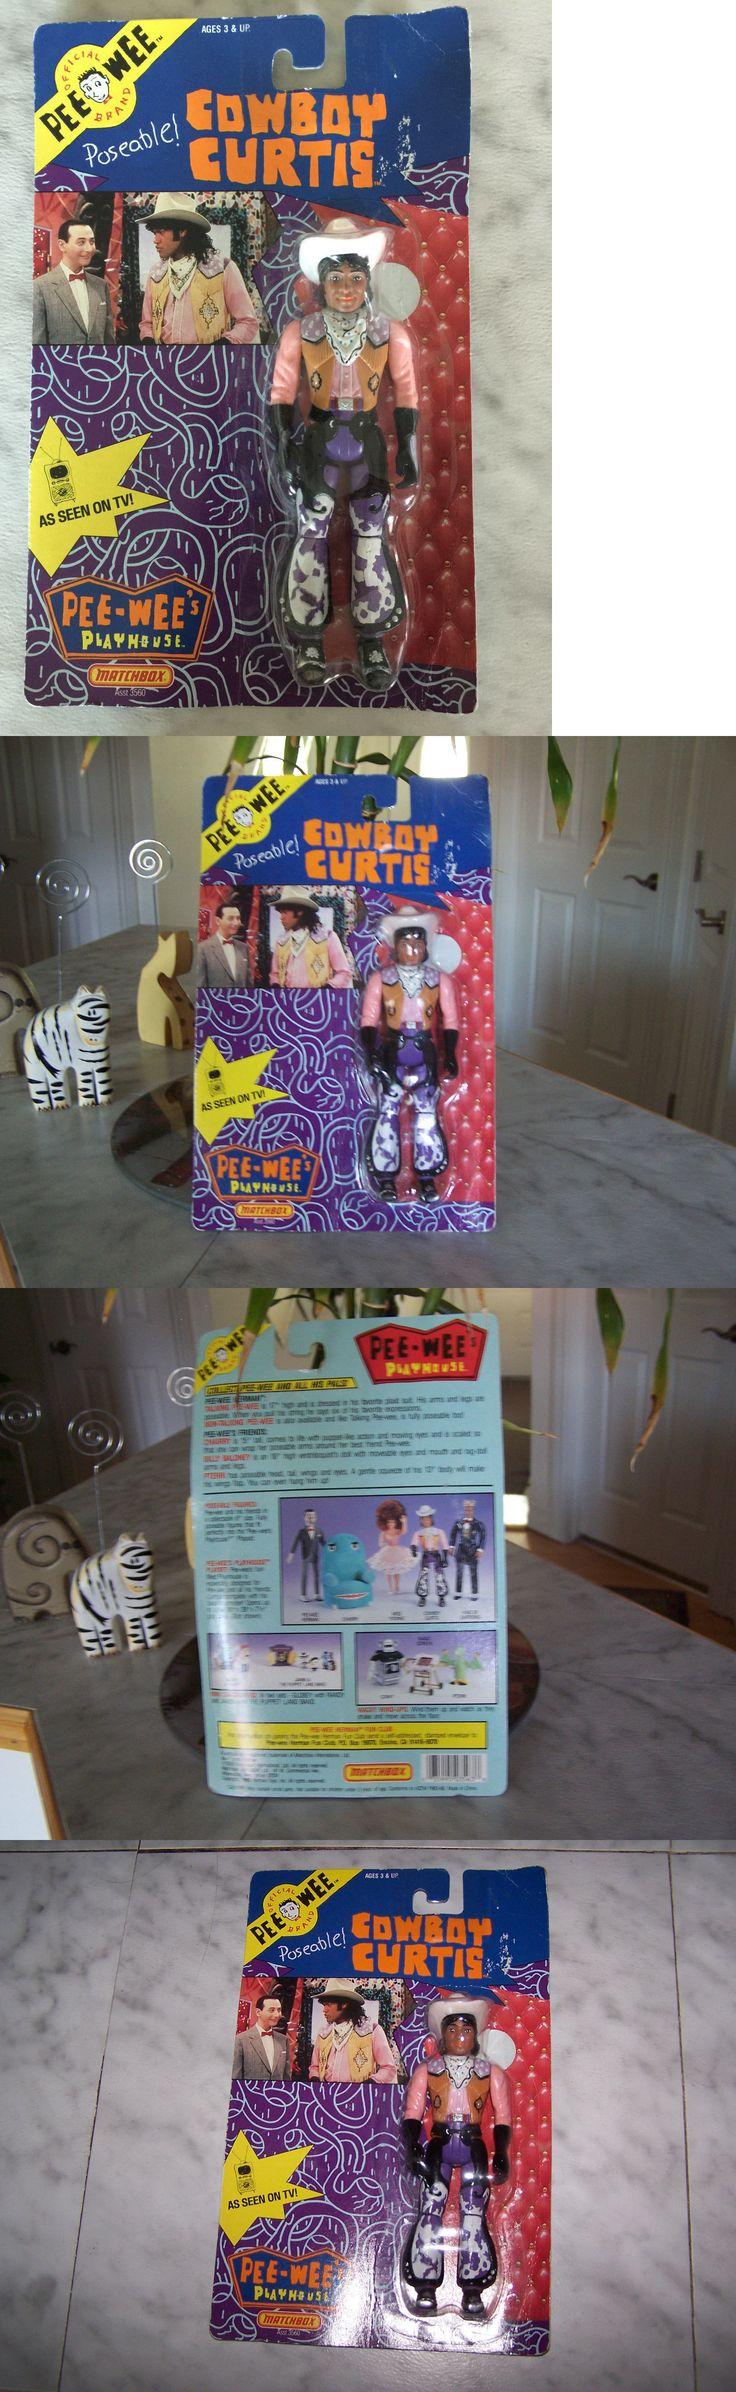 Pee-Wee Herman 20917: 1988 Pee Wee Playhouse Poseable Cowboy Curtis (New) -> BUY IT NOW ONLY: $32.67 on eBay!